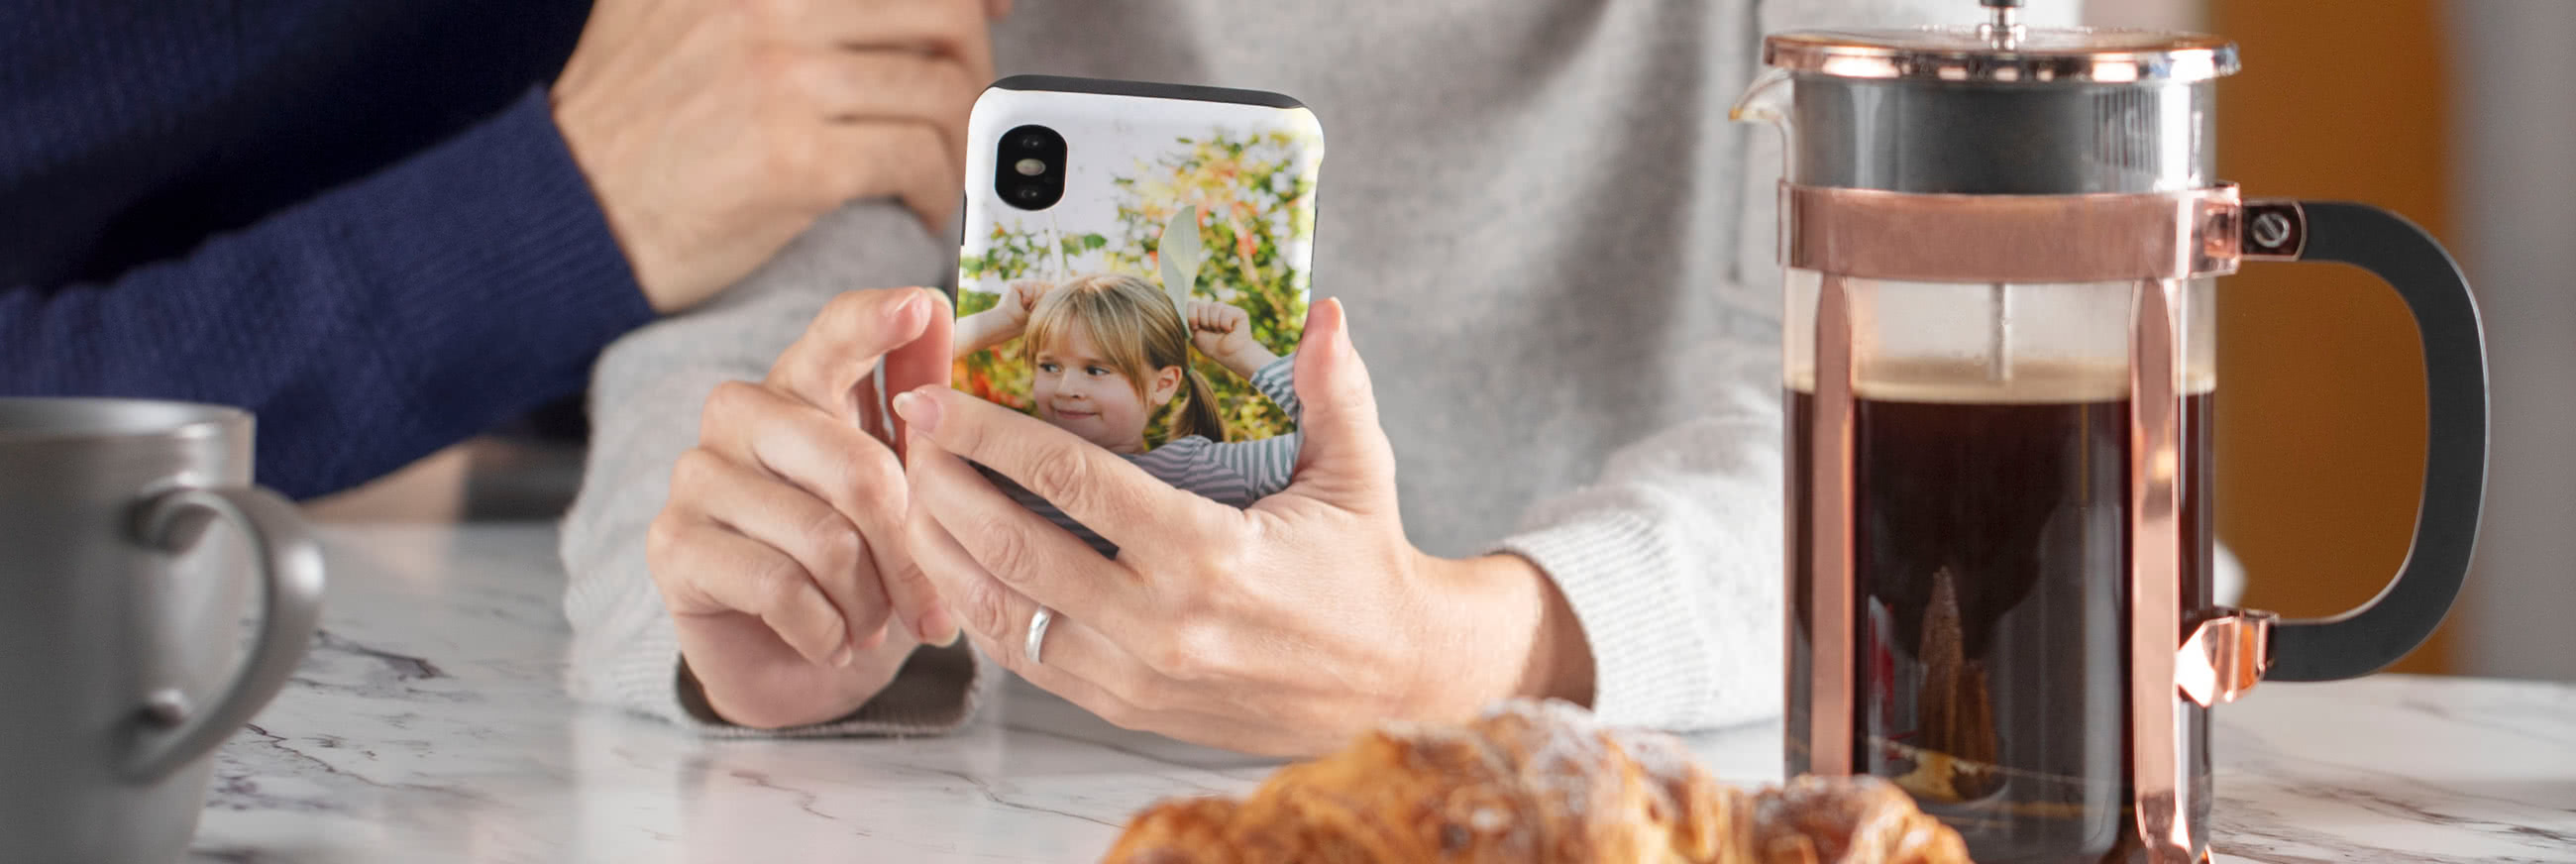 iPhone coque personnalisée